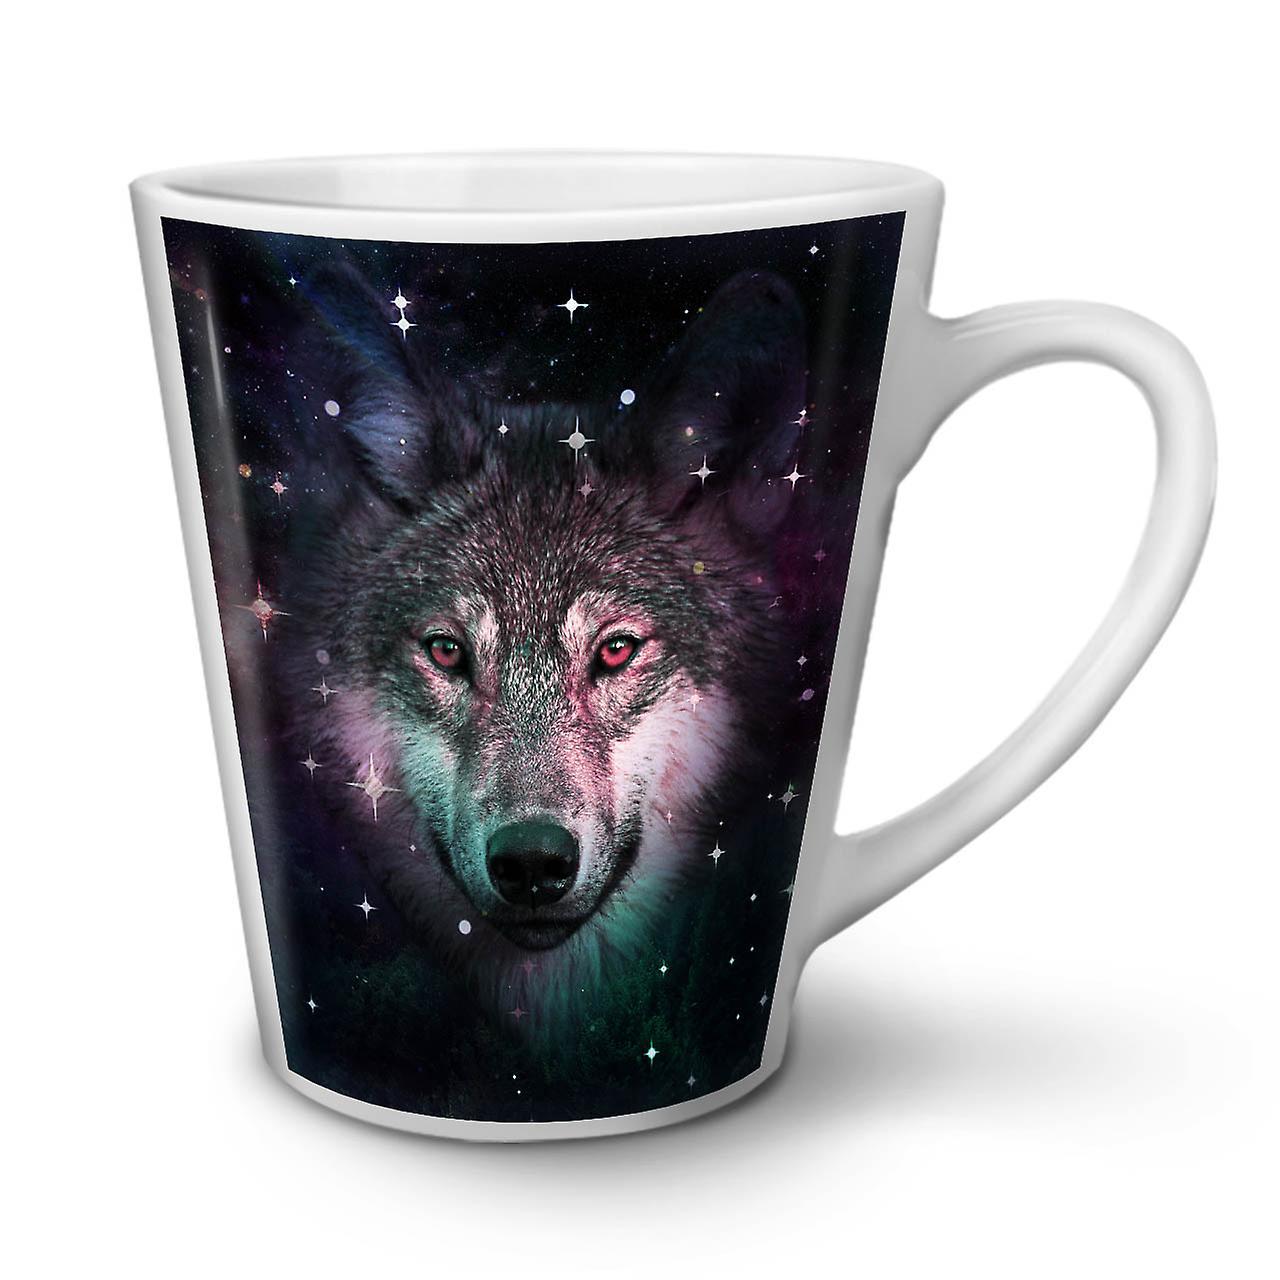 OzWellcoda Café Blanche Loup Céramique 12 Cosmos Nouvelle Animal Tasse En Latte Espace zqMpSVU